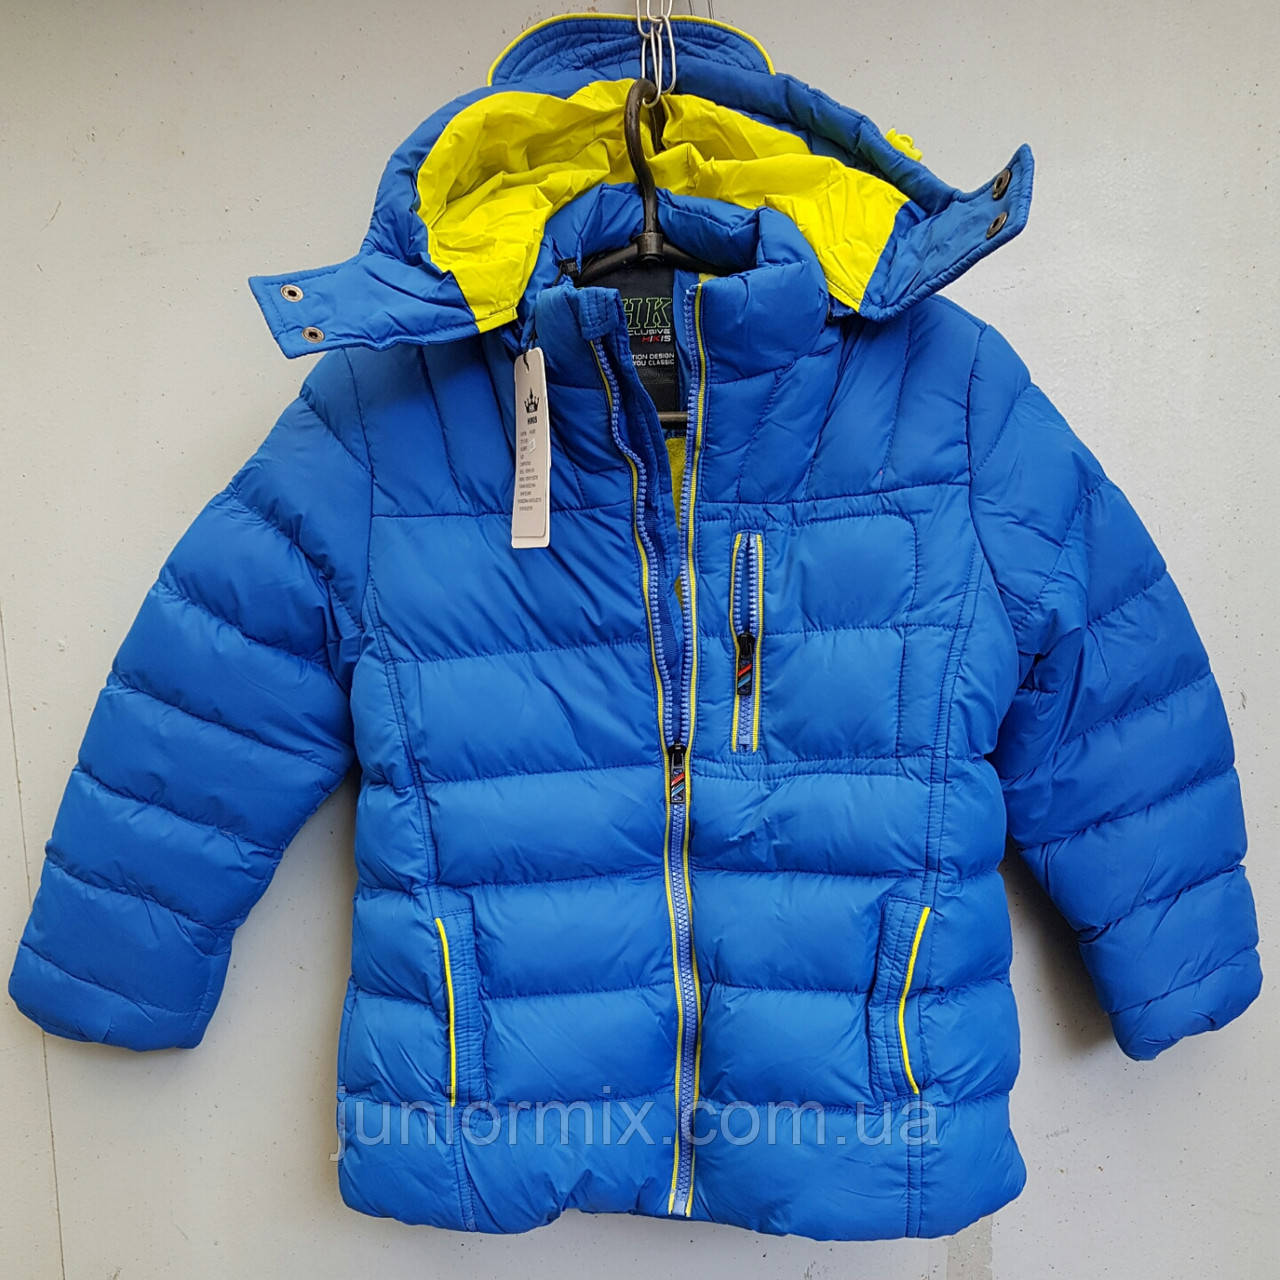 Куртка зимняя на мальчика HIKIS. Польша.